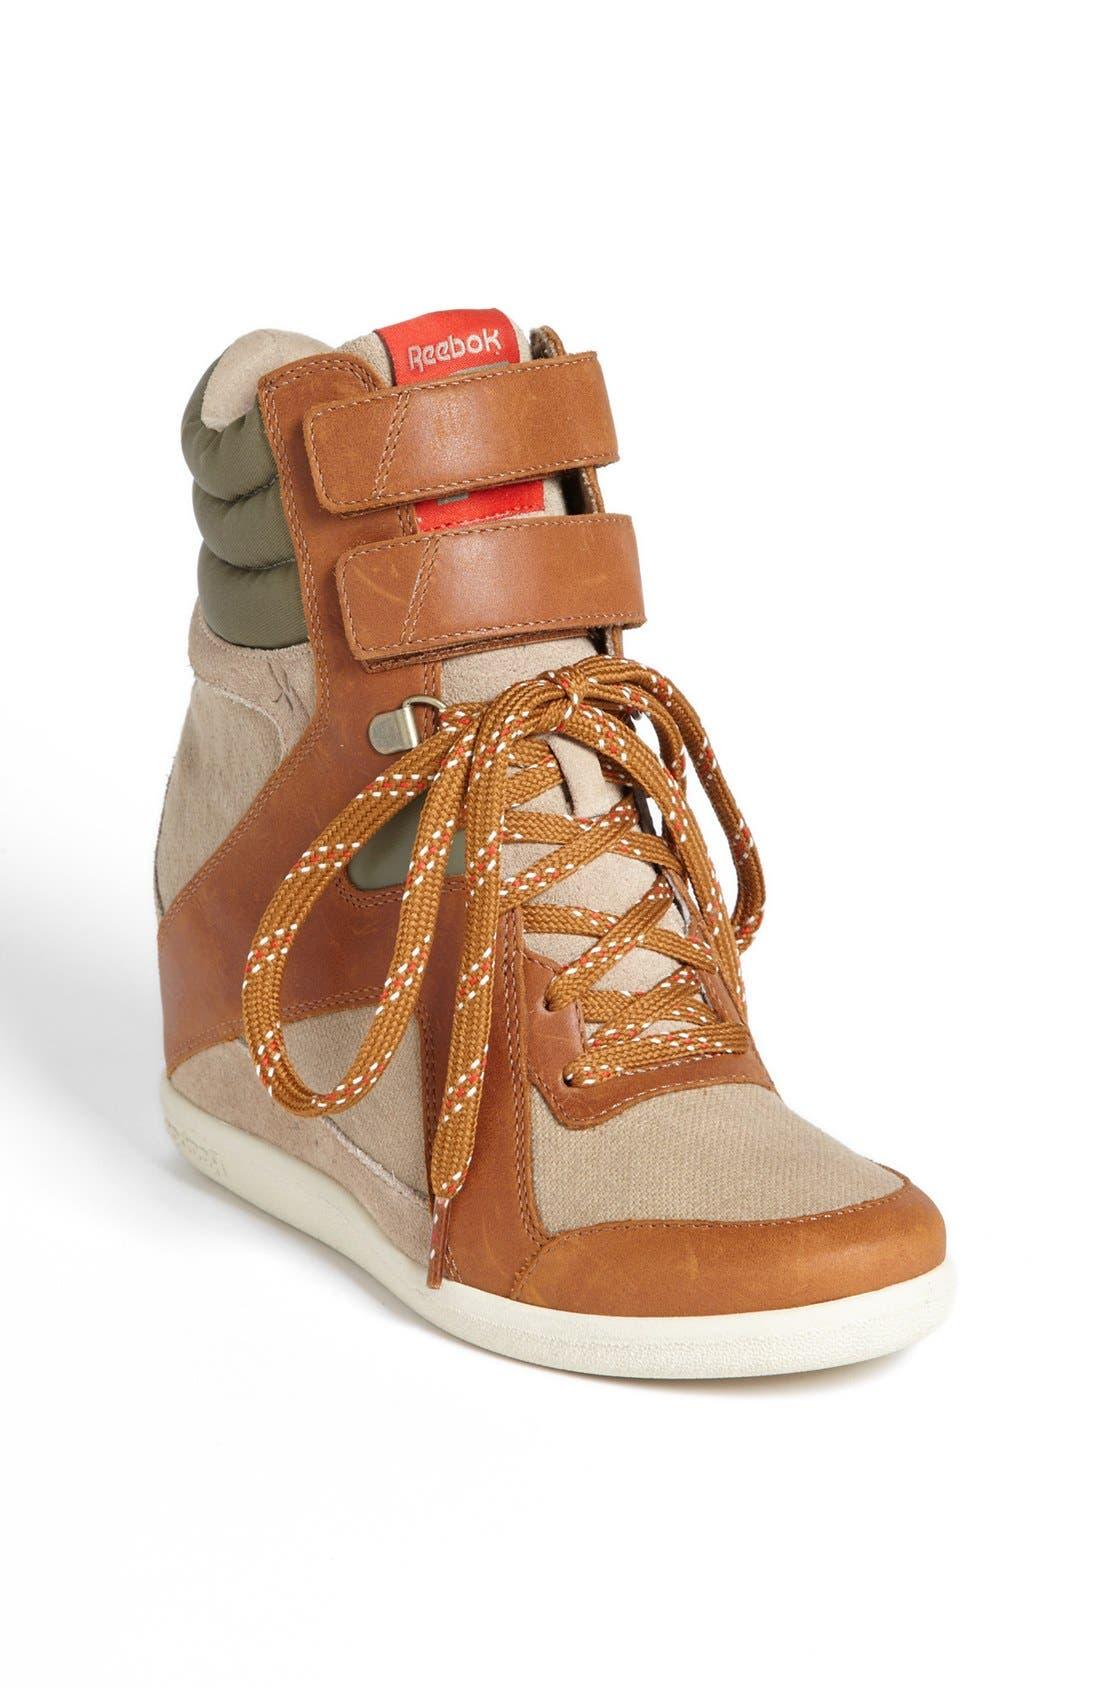 Alternate Image 1 Selected - Reebok 'Wedge A. Keys' Sneaker (Women)